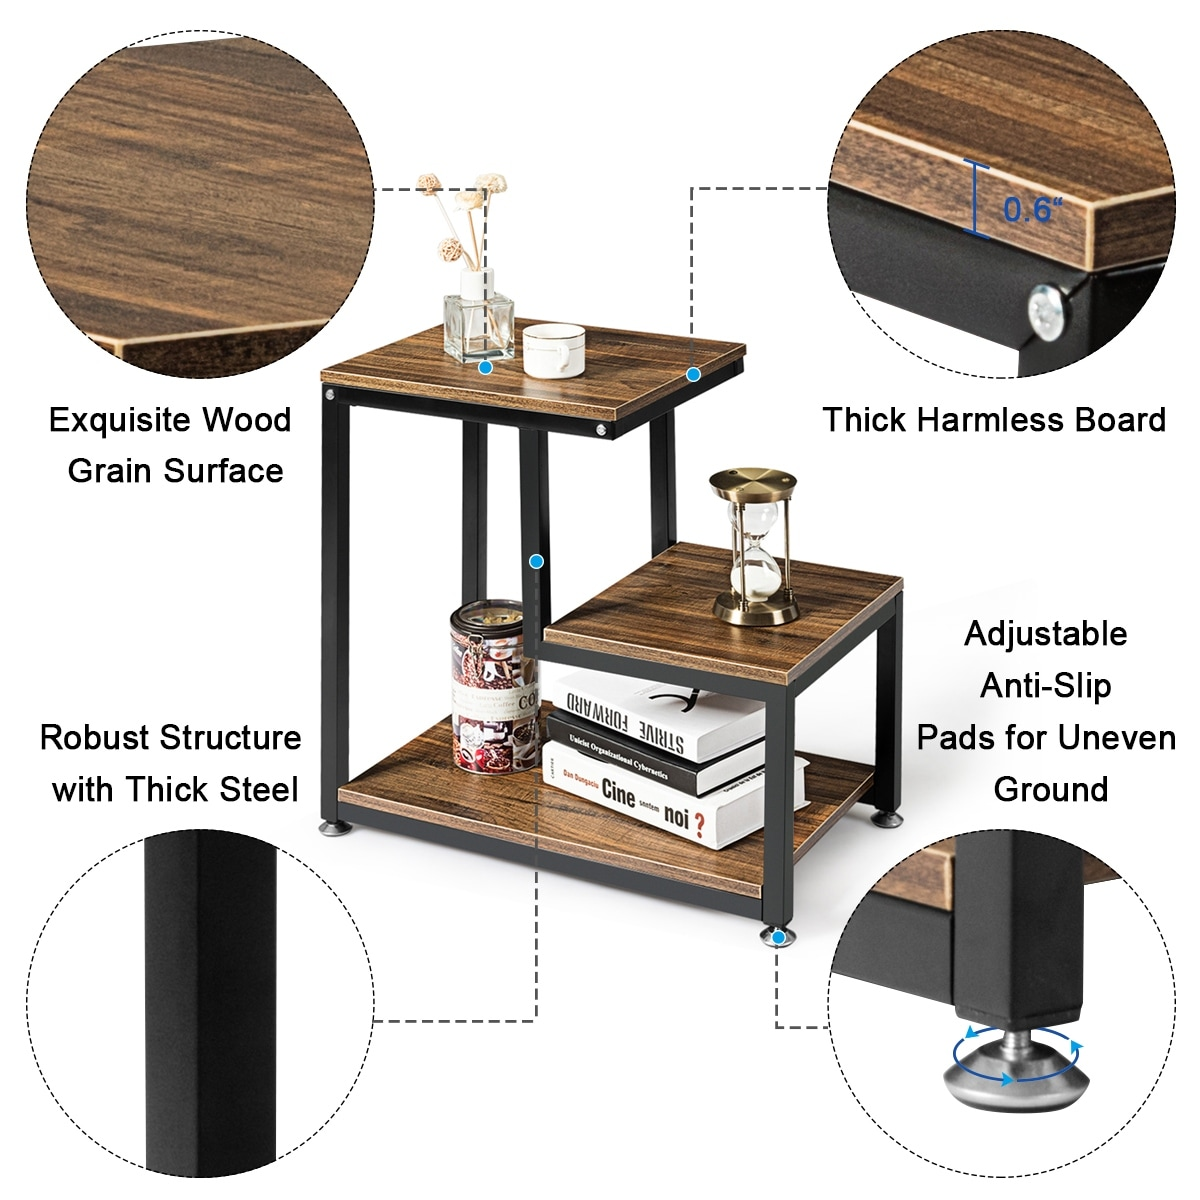 Industrial End Table Vintage Metal Frame Side Table Living Room Bedroom Open Storage Shelf Nightstand Coffee Table Wood Grain Color Mimbarschool Com Ng